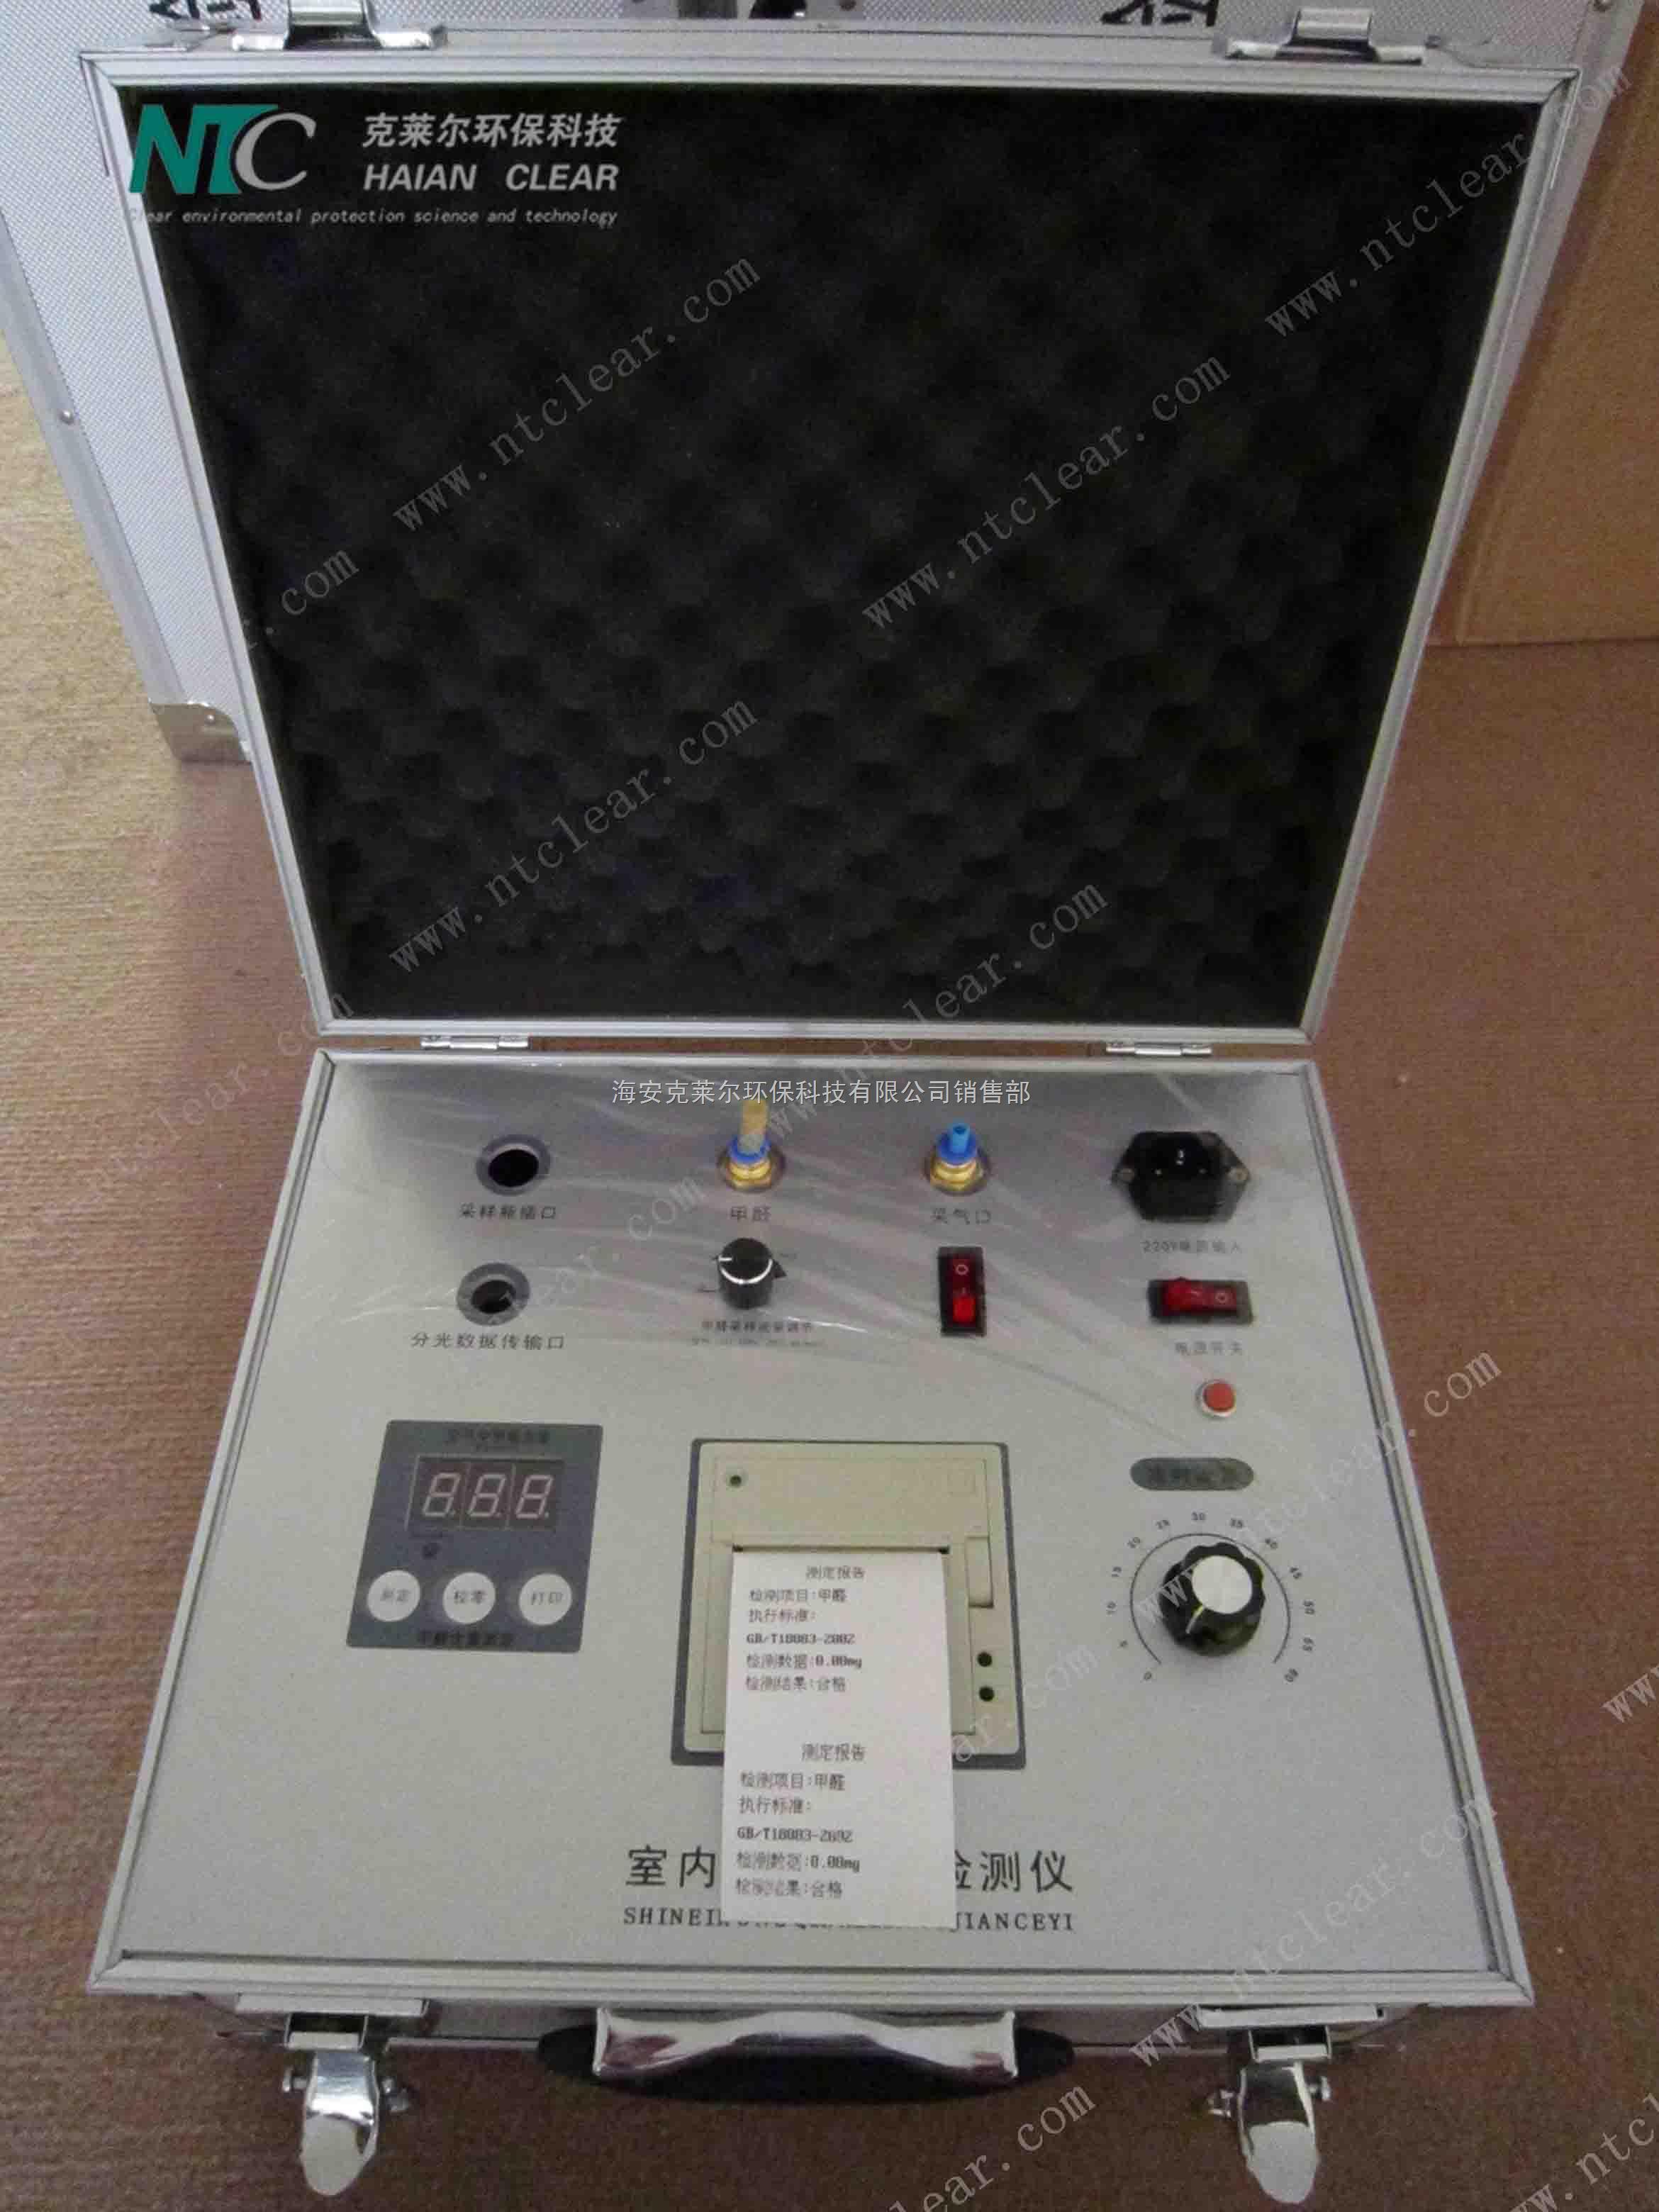 NTC-1-江苏甲醛检测仪/固定式甲醛检测仪/江苏便携式甲醛检测仪价格